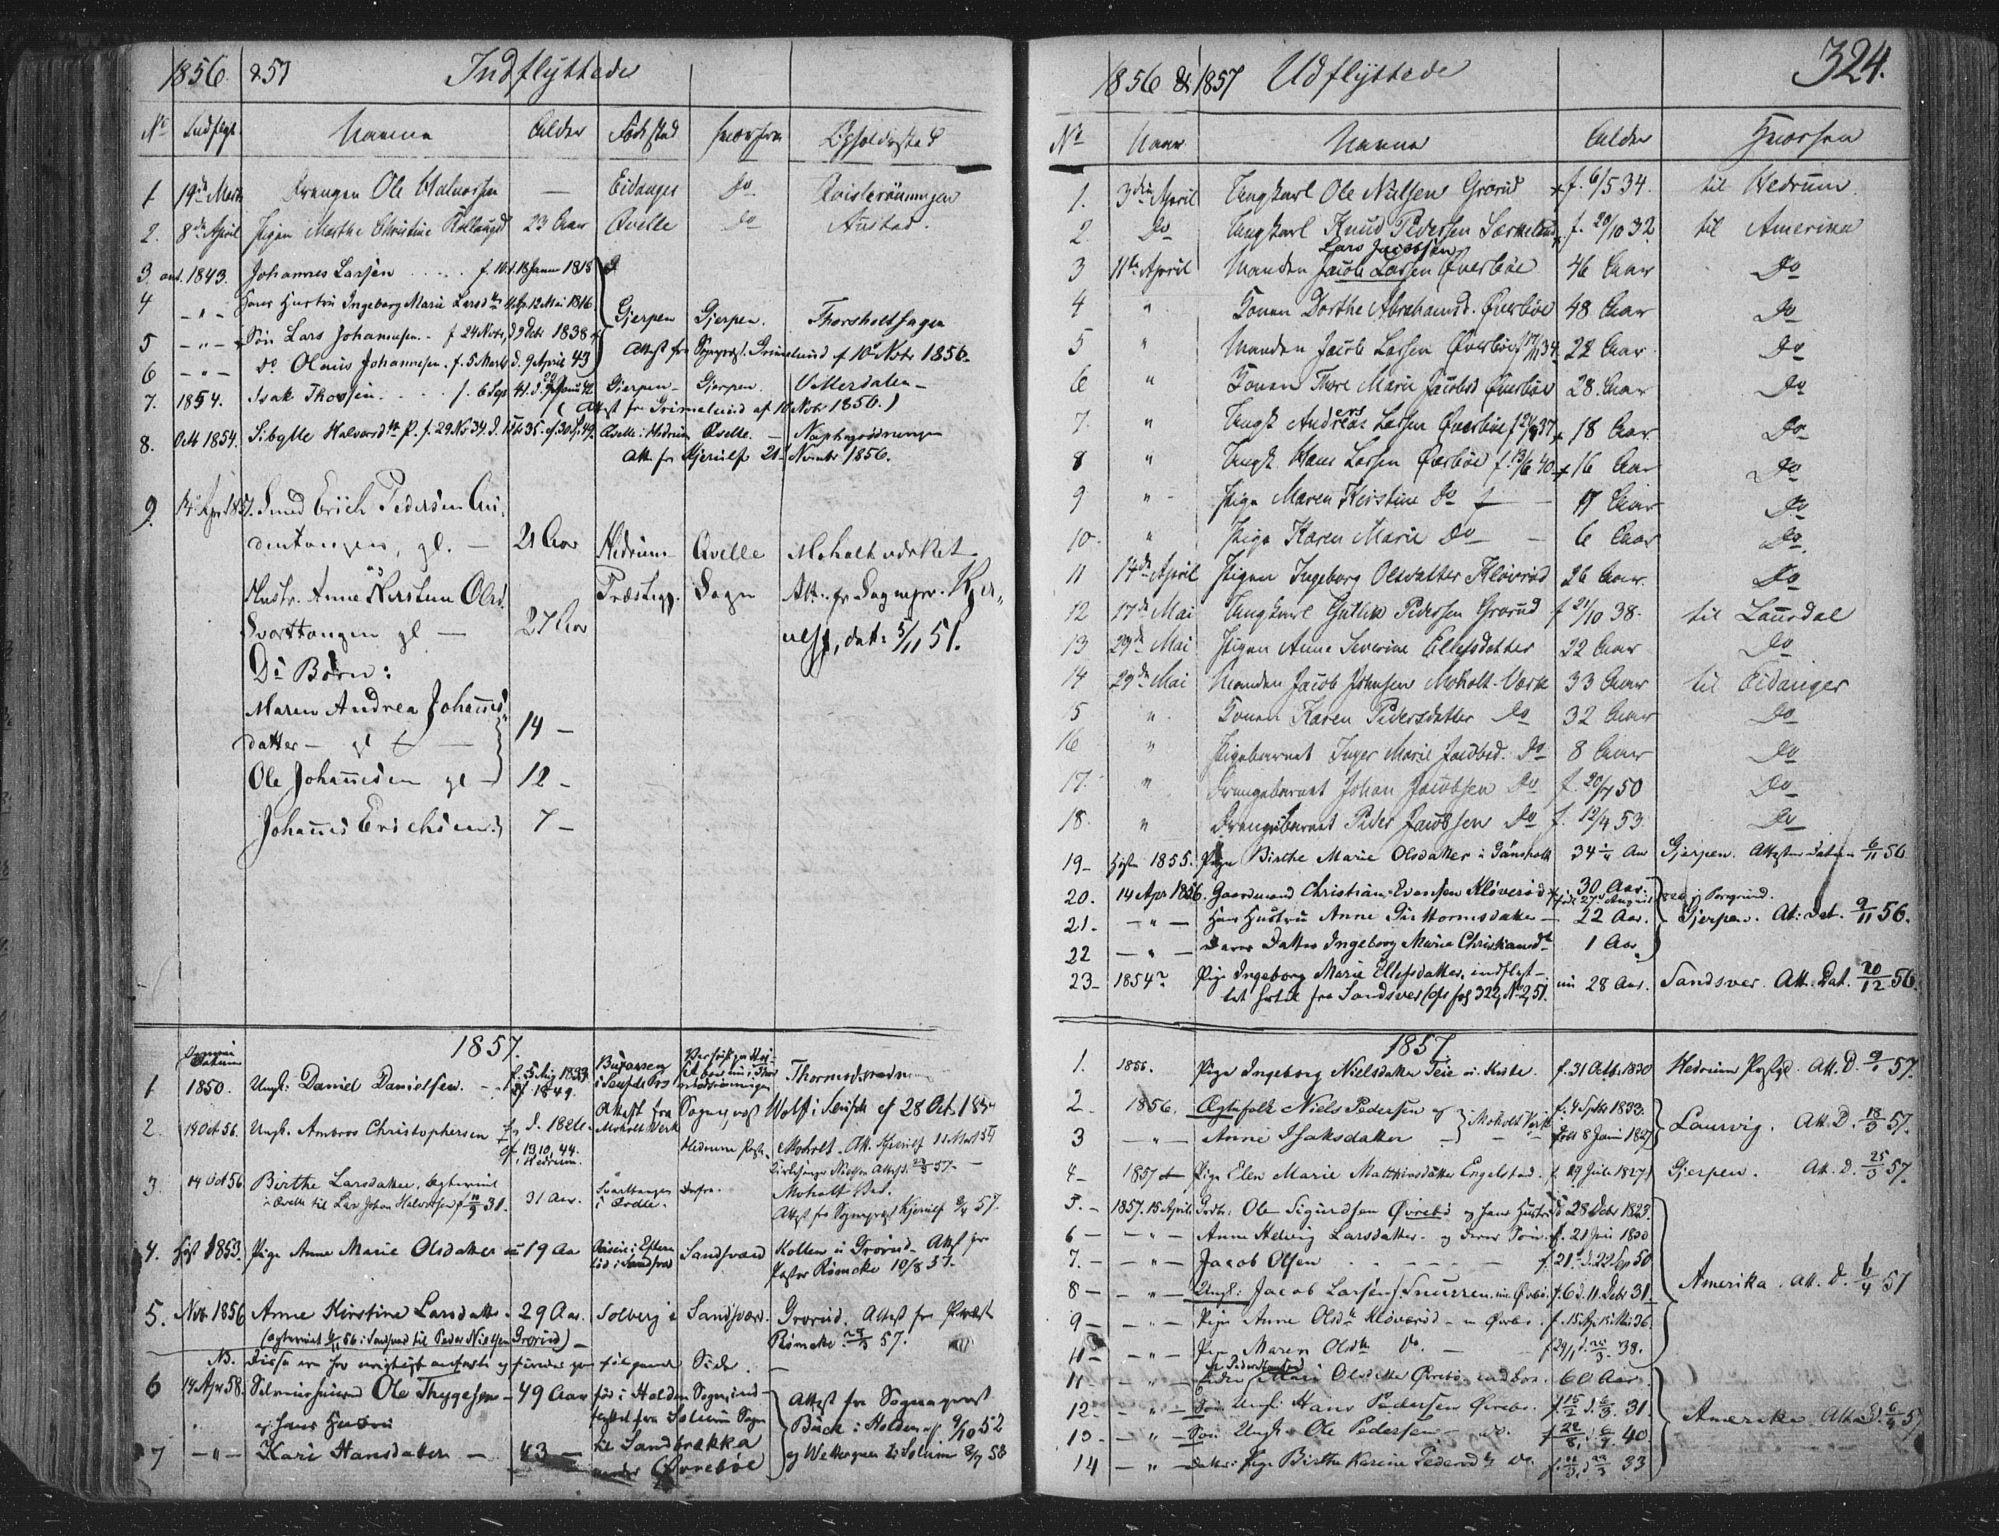 SAKO, Siljan kirkebøker, F/Fa/L0001: Parish register (official) no. 1, 1831-1870, p. 324